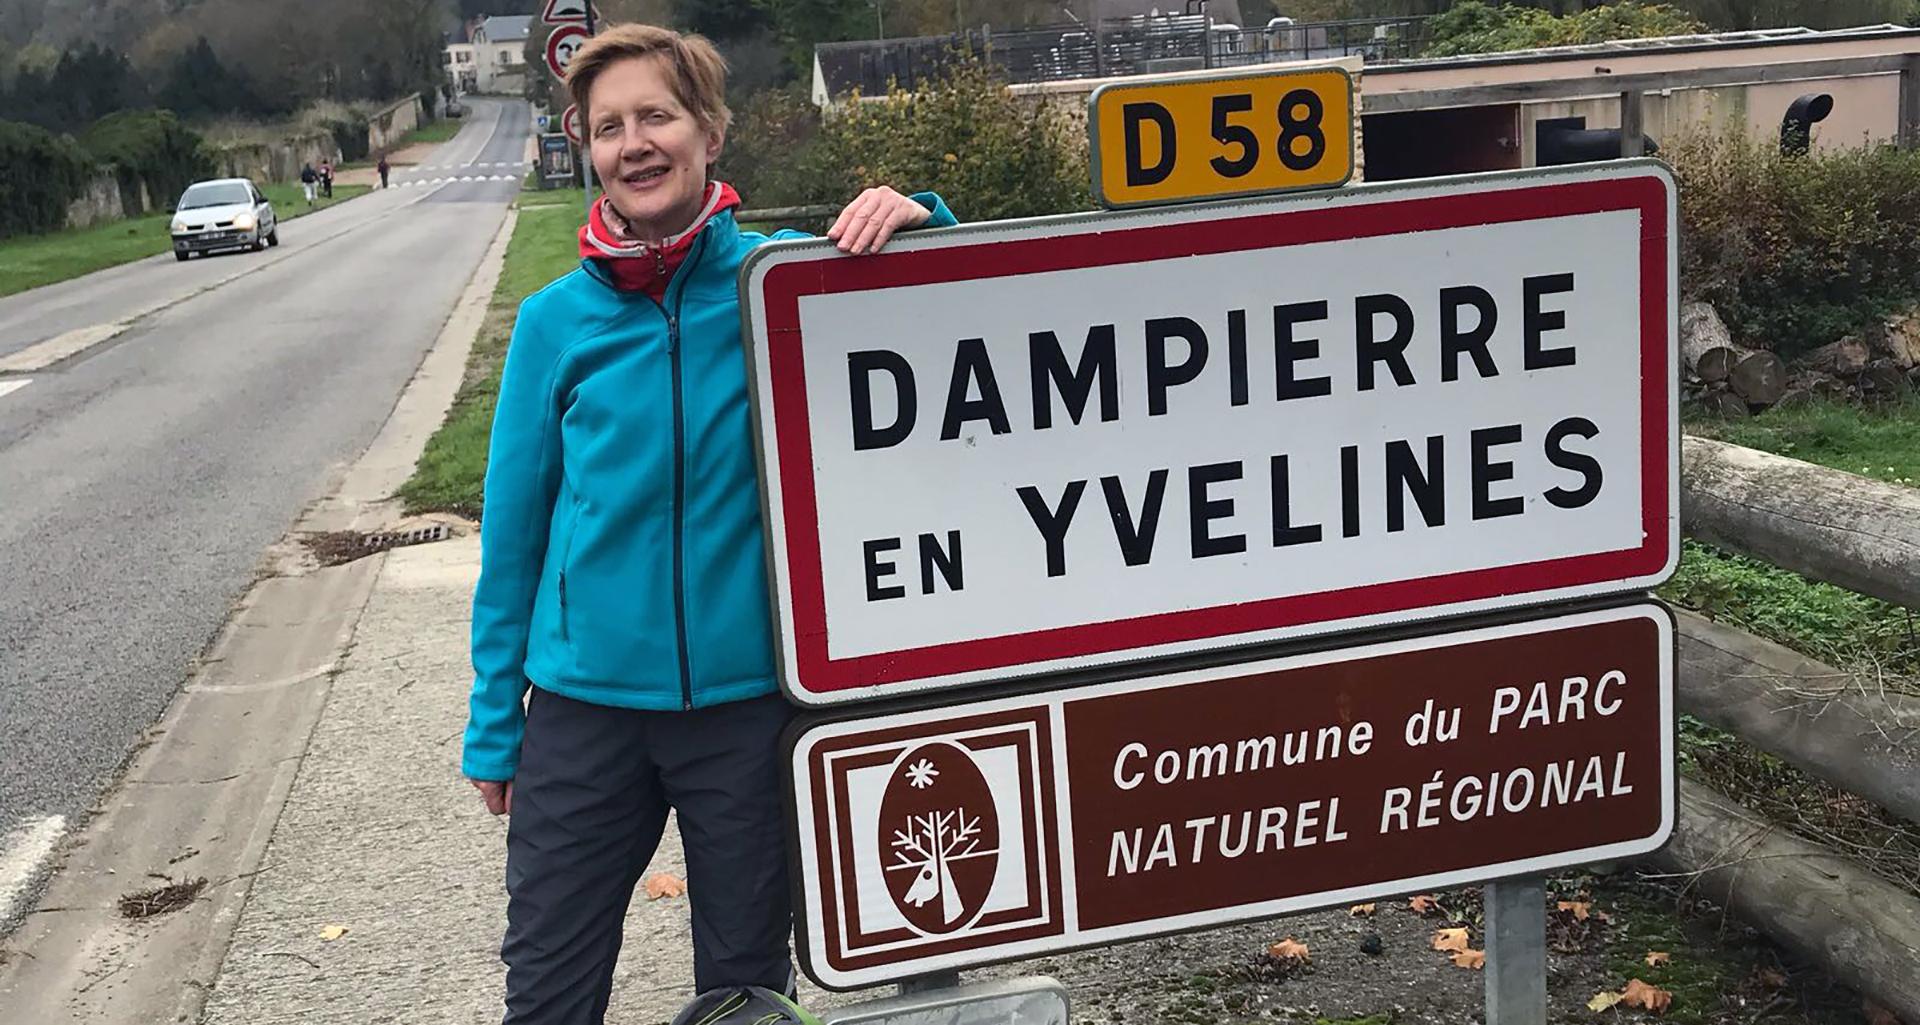 Dampierre town, namesake